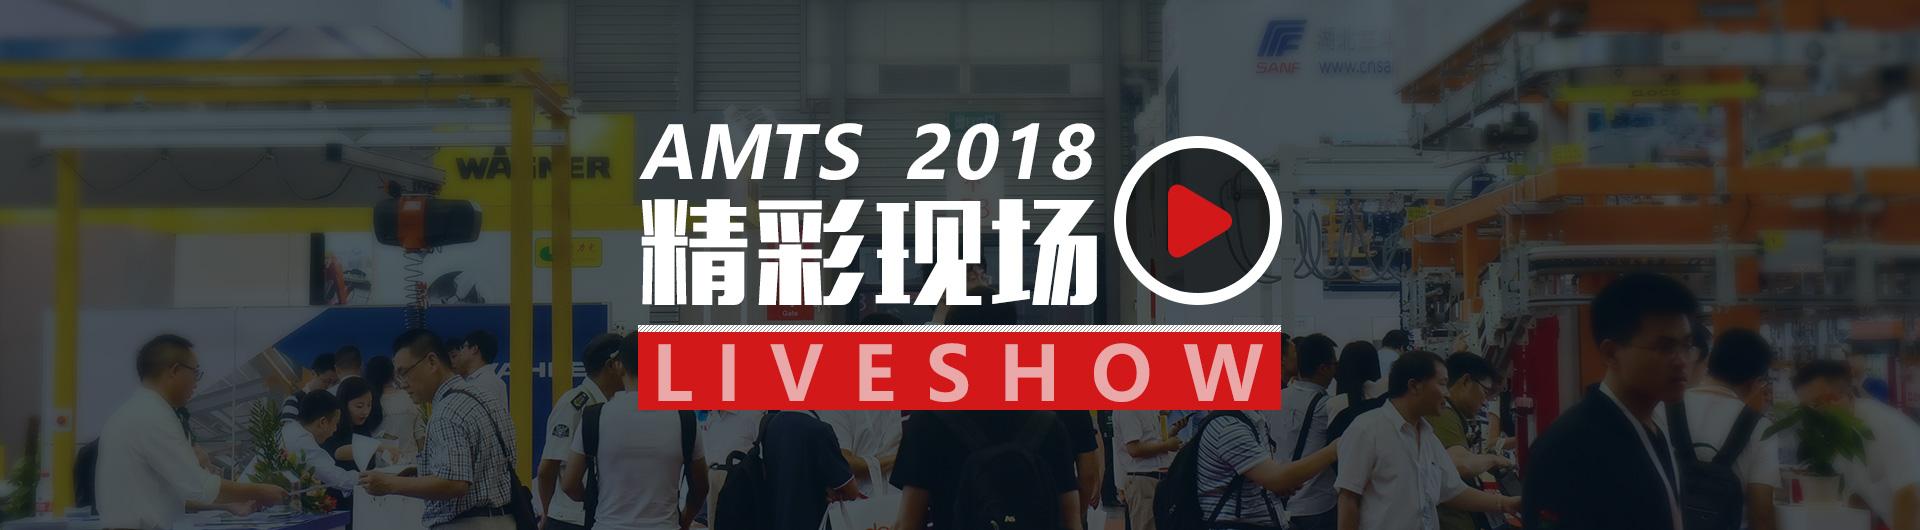 AMTS 2018现场花絮